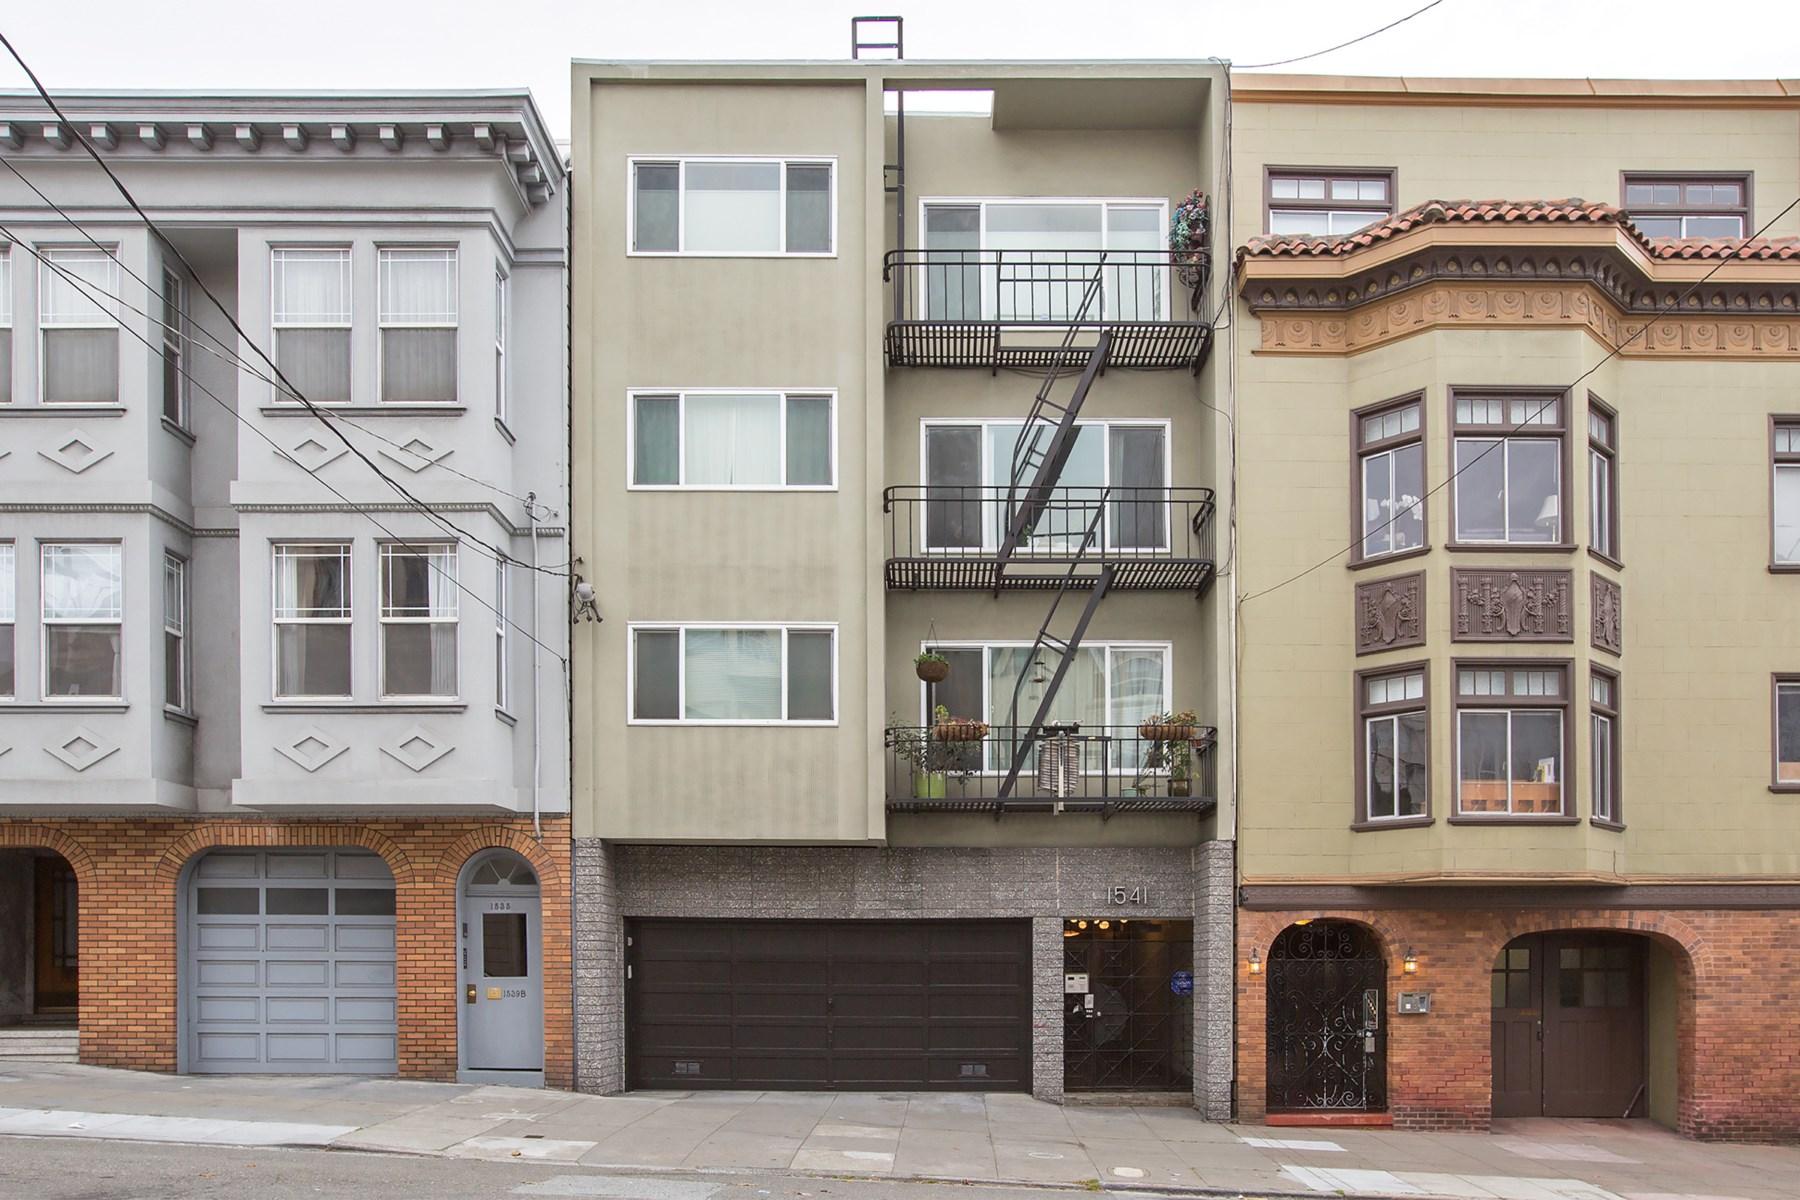 Condomínio para Venda às Fabulous Filbert 1541 Filbert St Apt 1 Cow Hollow, San Francisco, Califórnia 94123 Estados Unidos